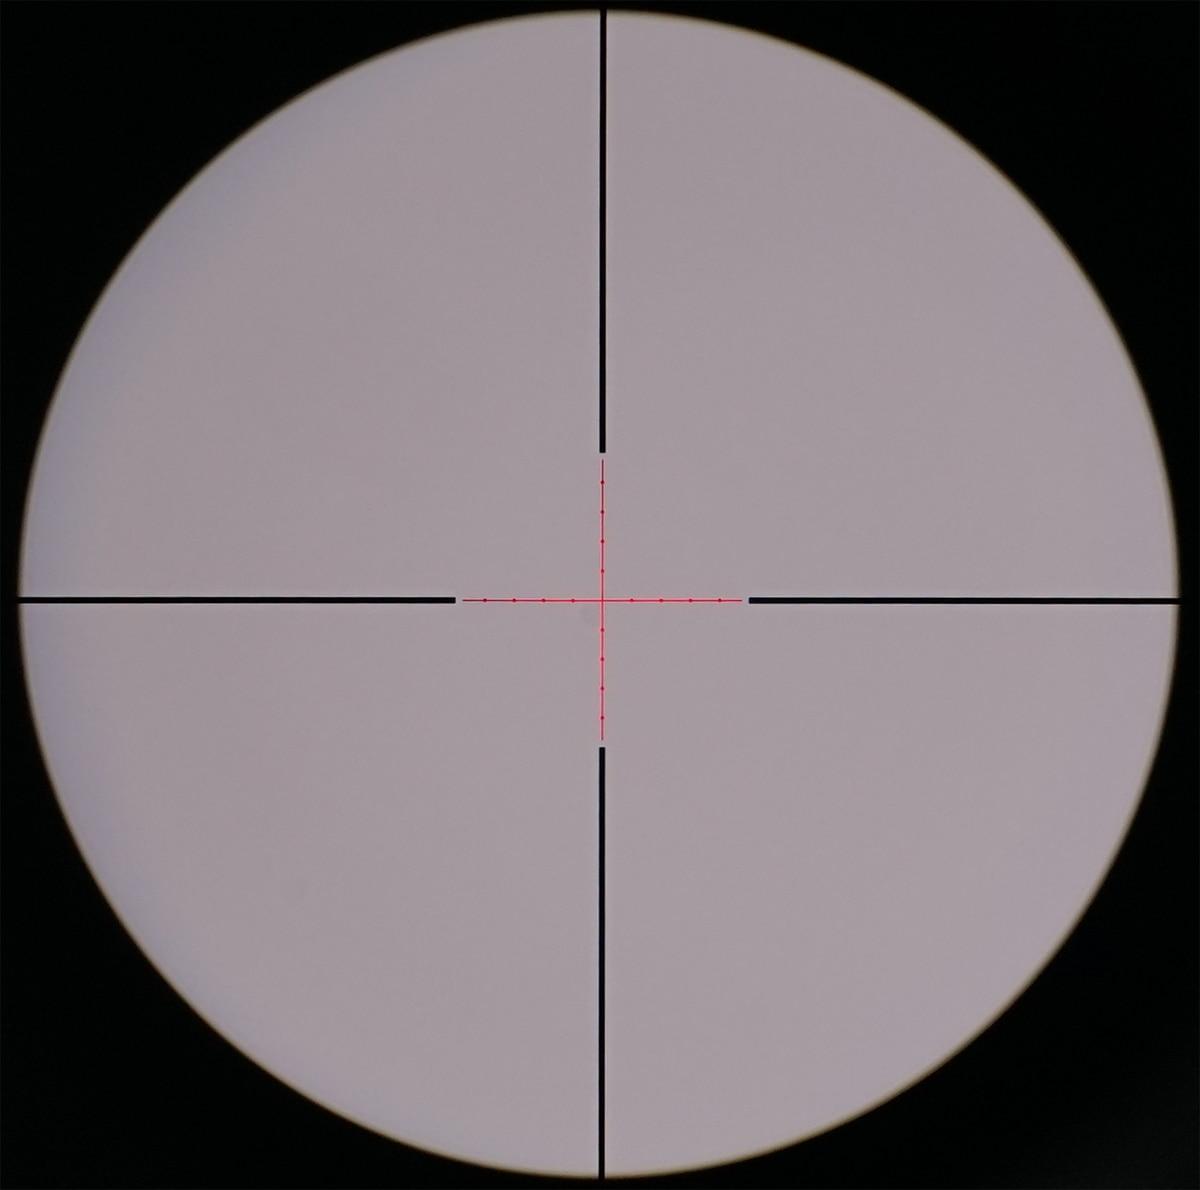 âmbito longo alcance 34mm cnc anel. 308